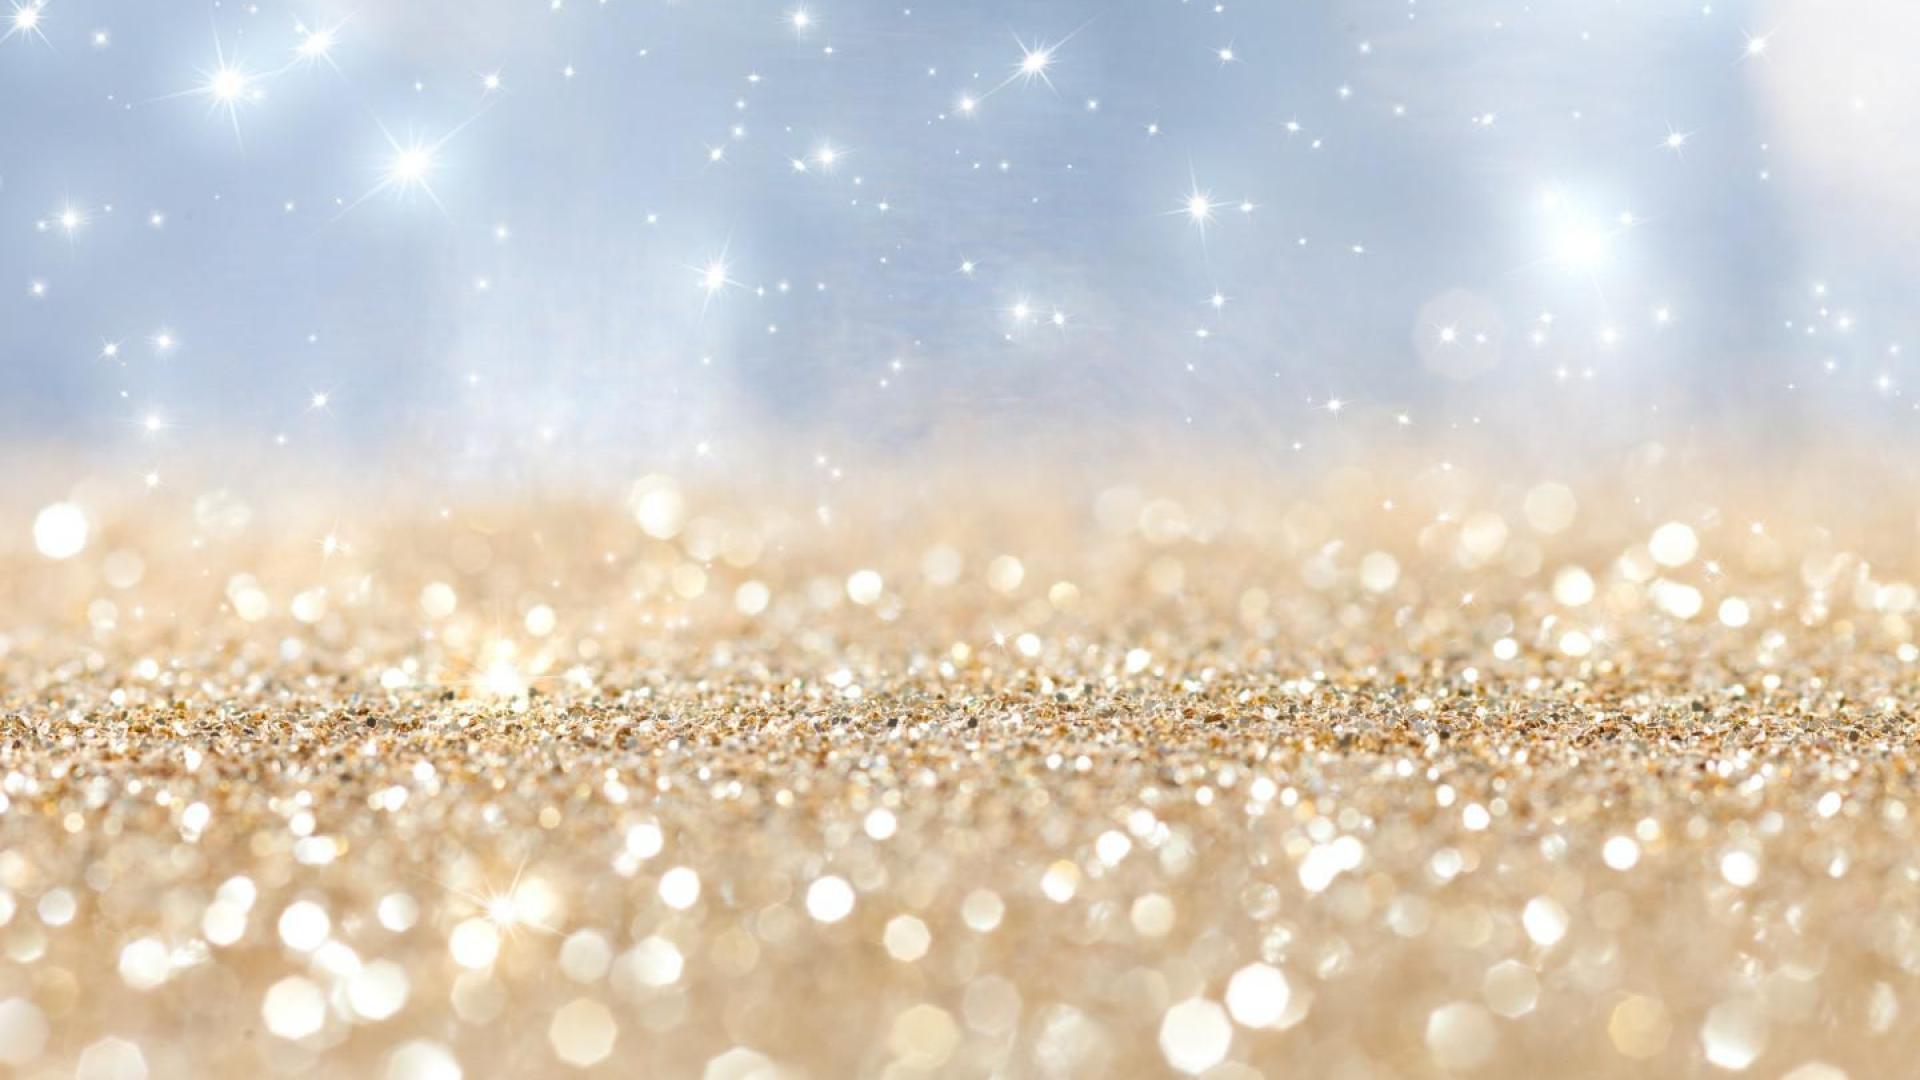 Rose Gold Glitter Backgrounds